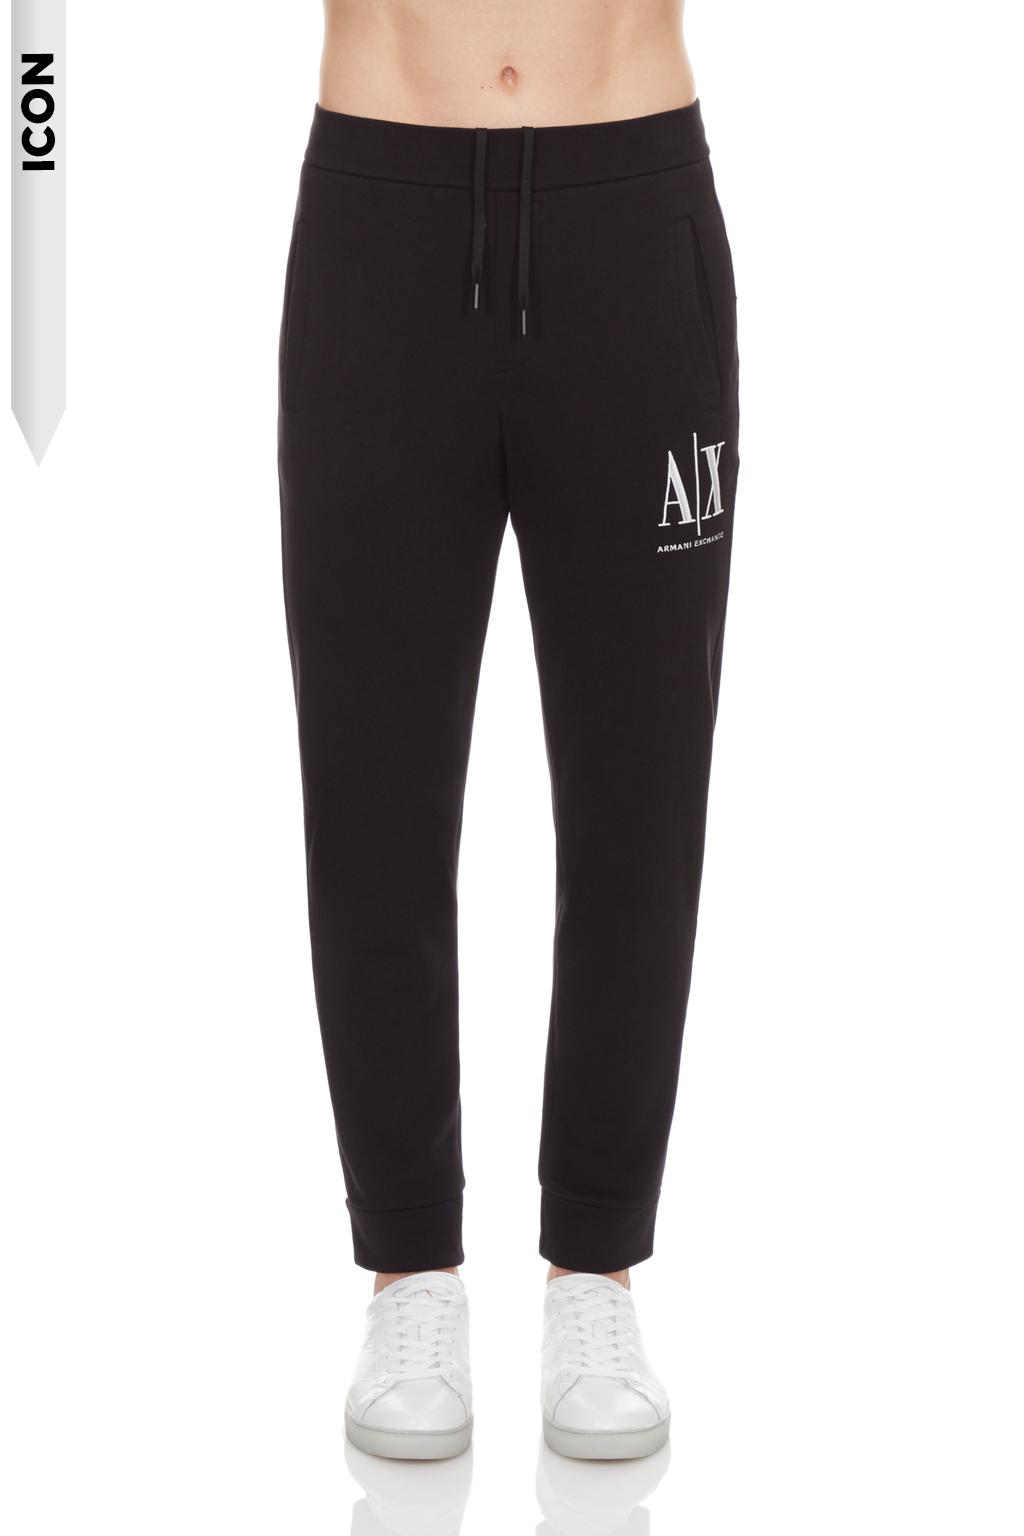 Pantaloni uomo ARMANI EXCHANGE icon A/X